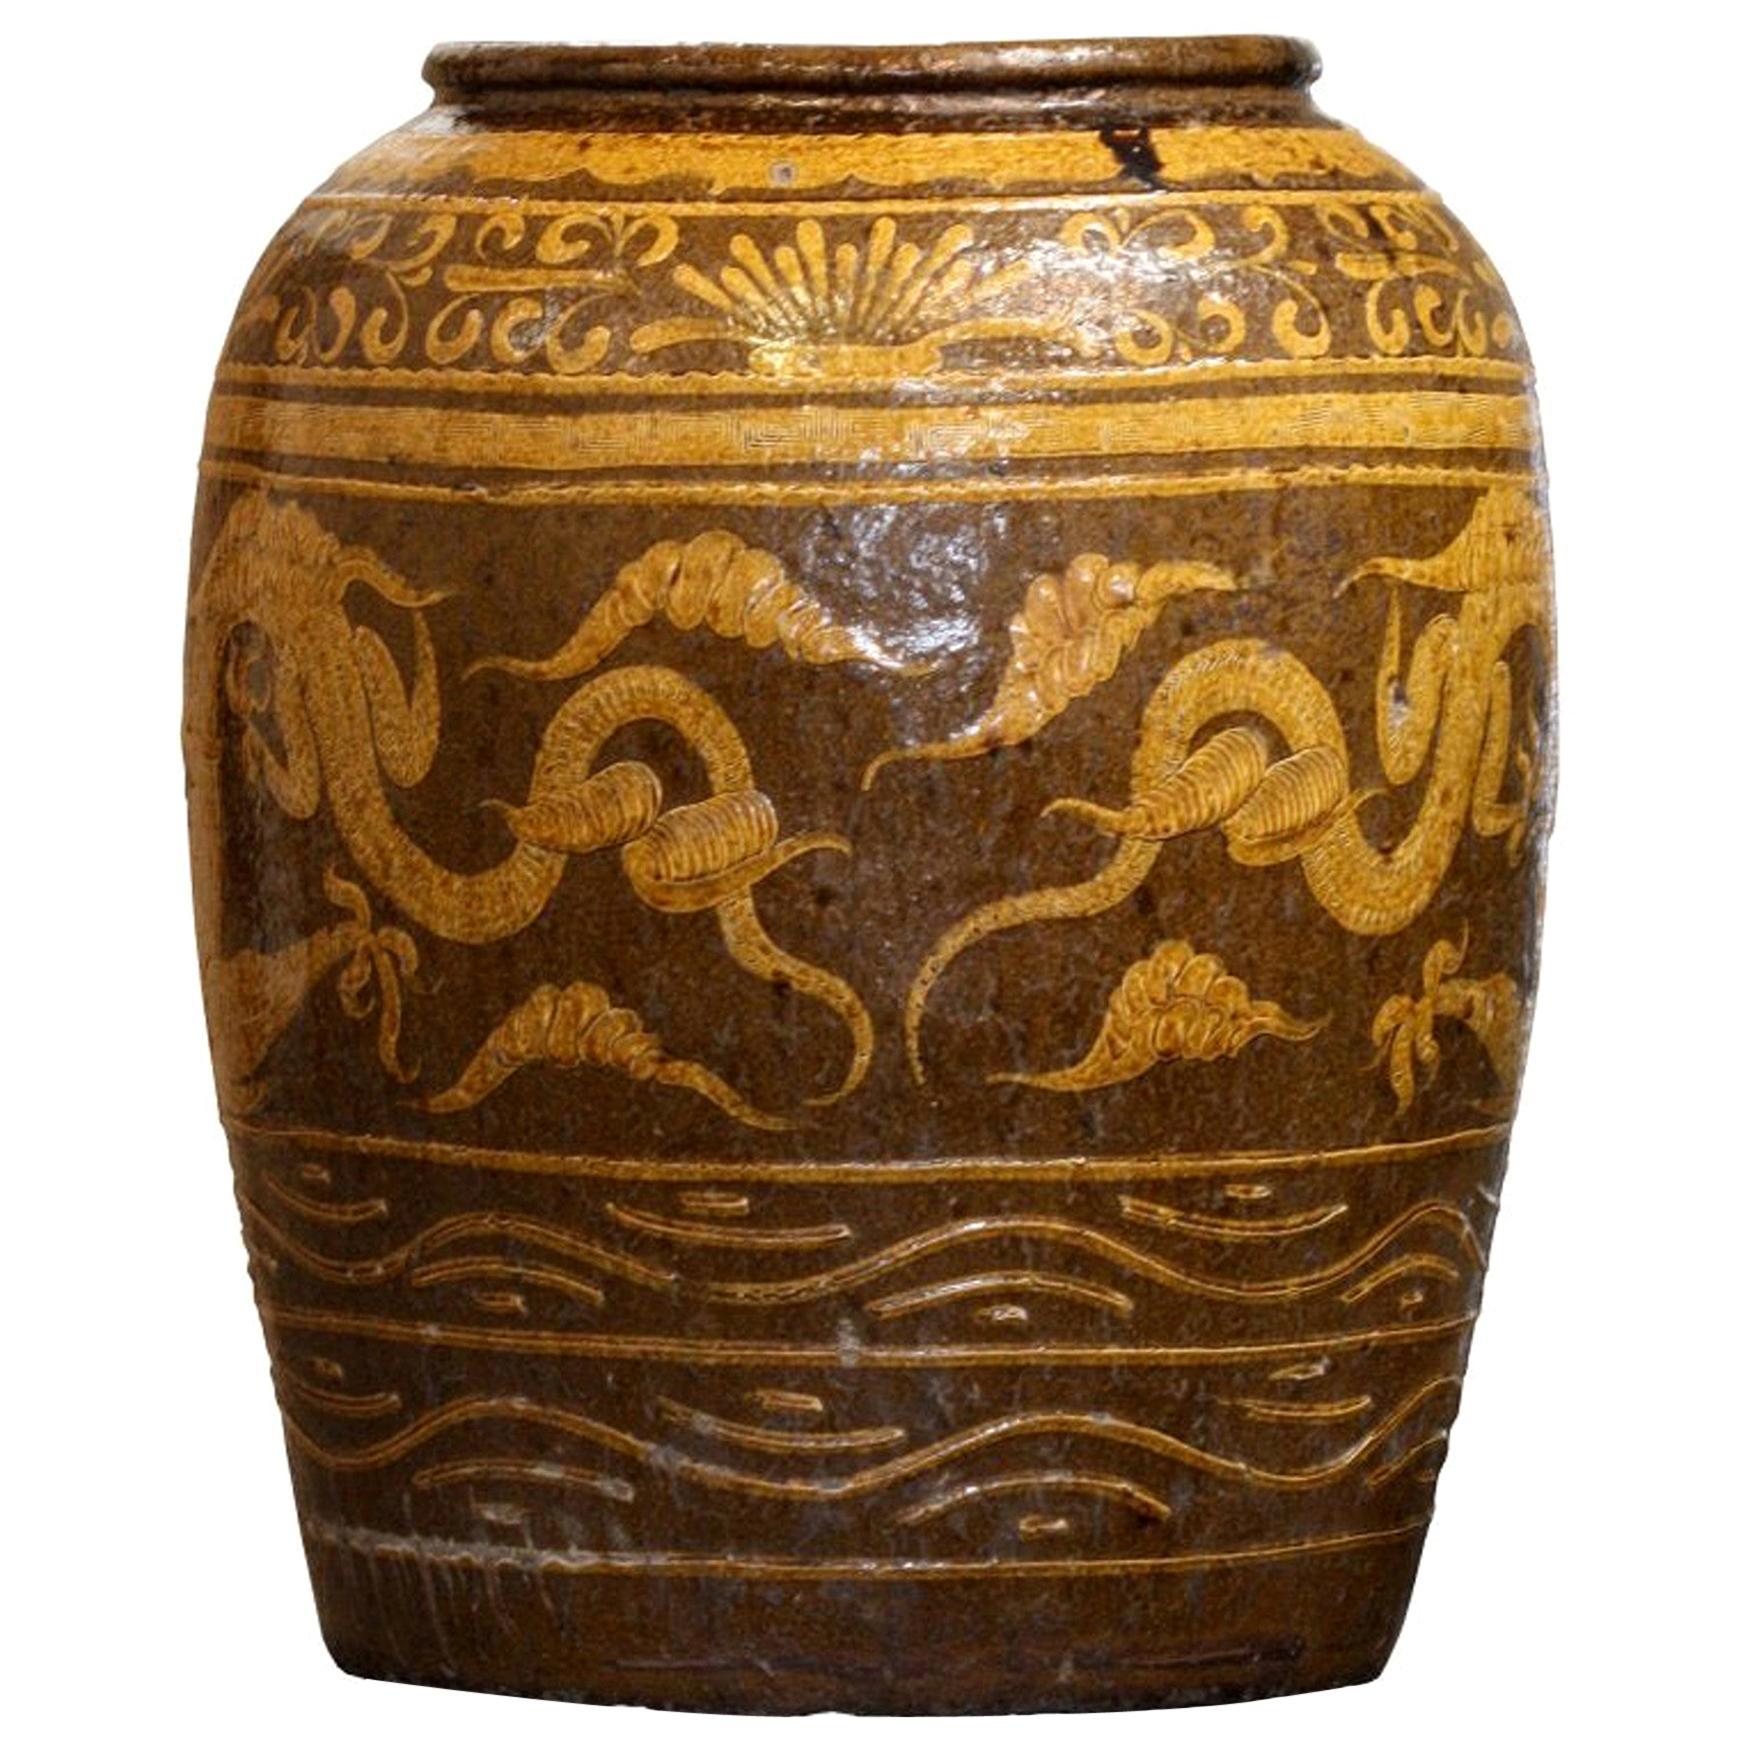 Massive Antique Chinese Earthenware Martaban Dragon Jar